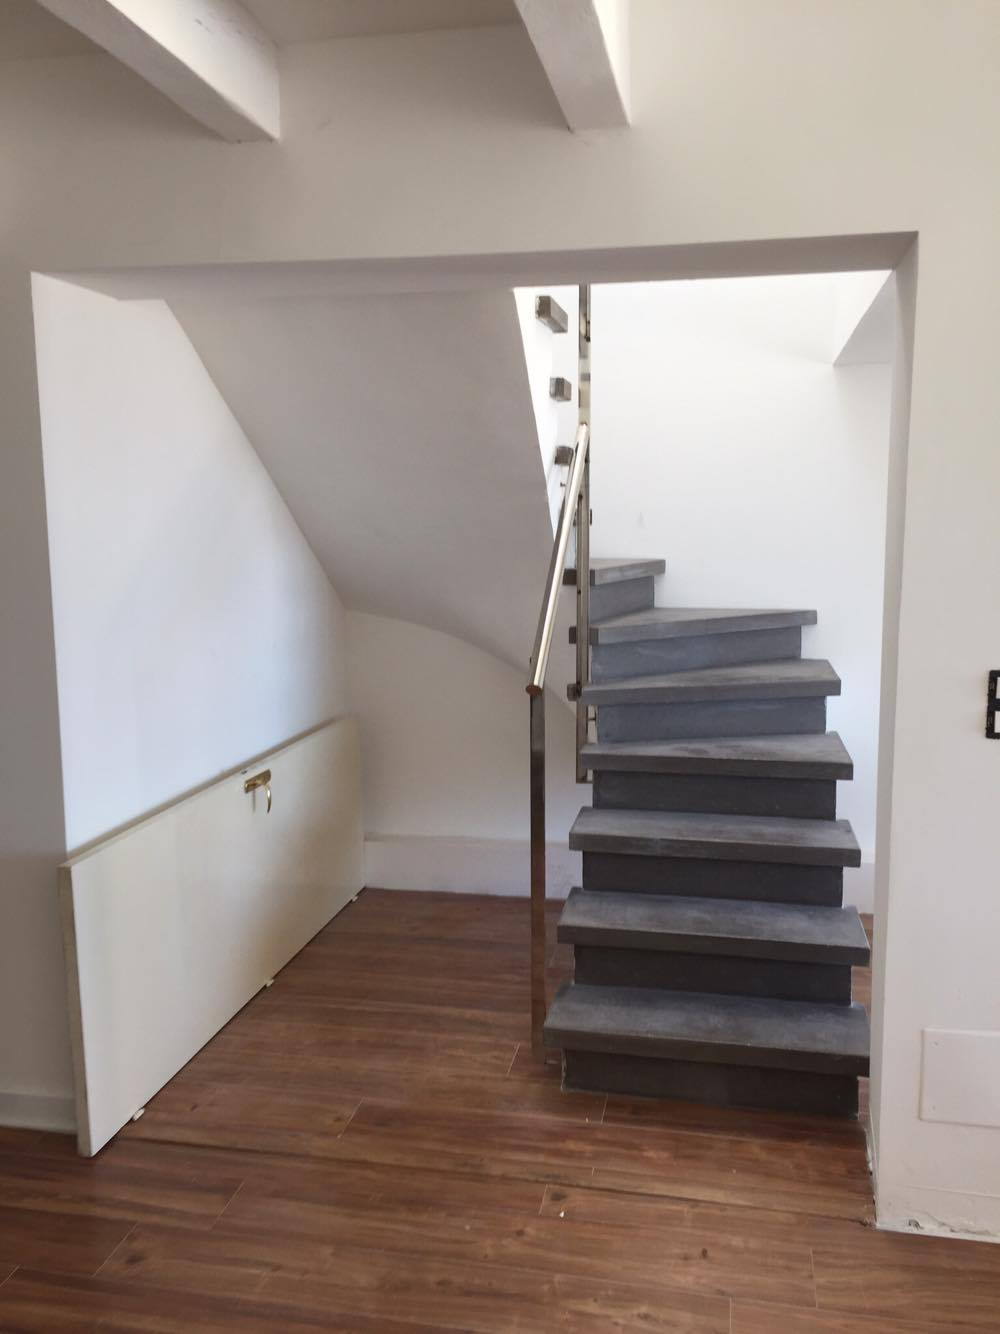 Fabrication et pose d 39 escalier en b ton teint for Fabrication escalier beton interieur